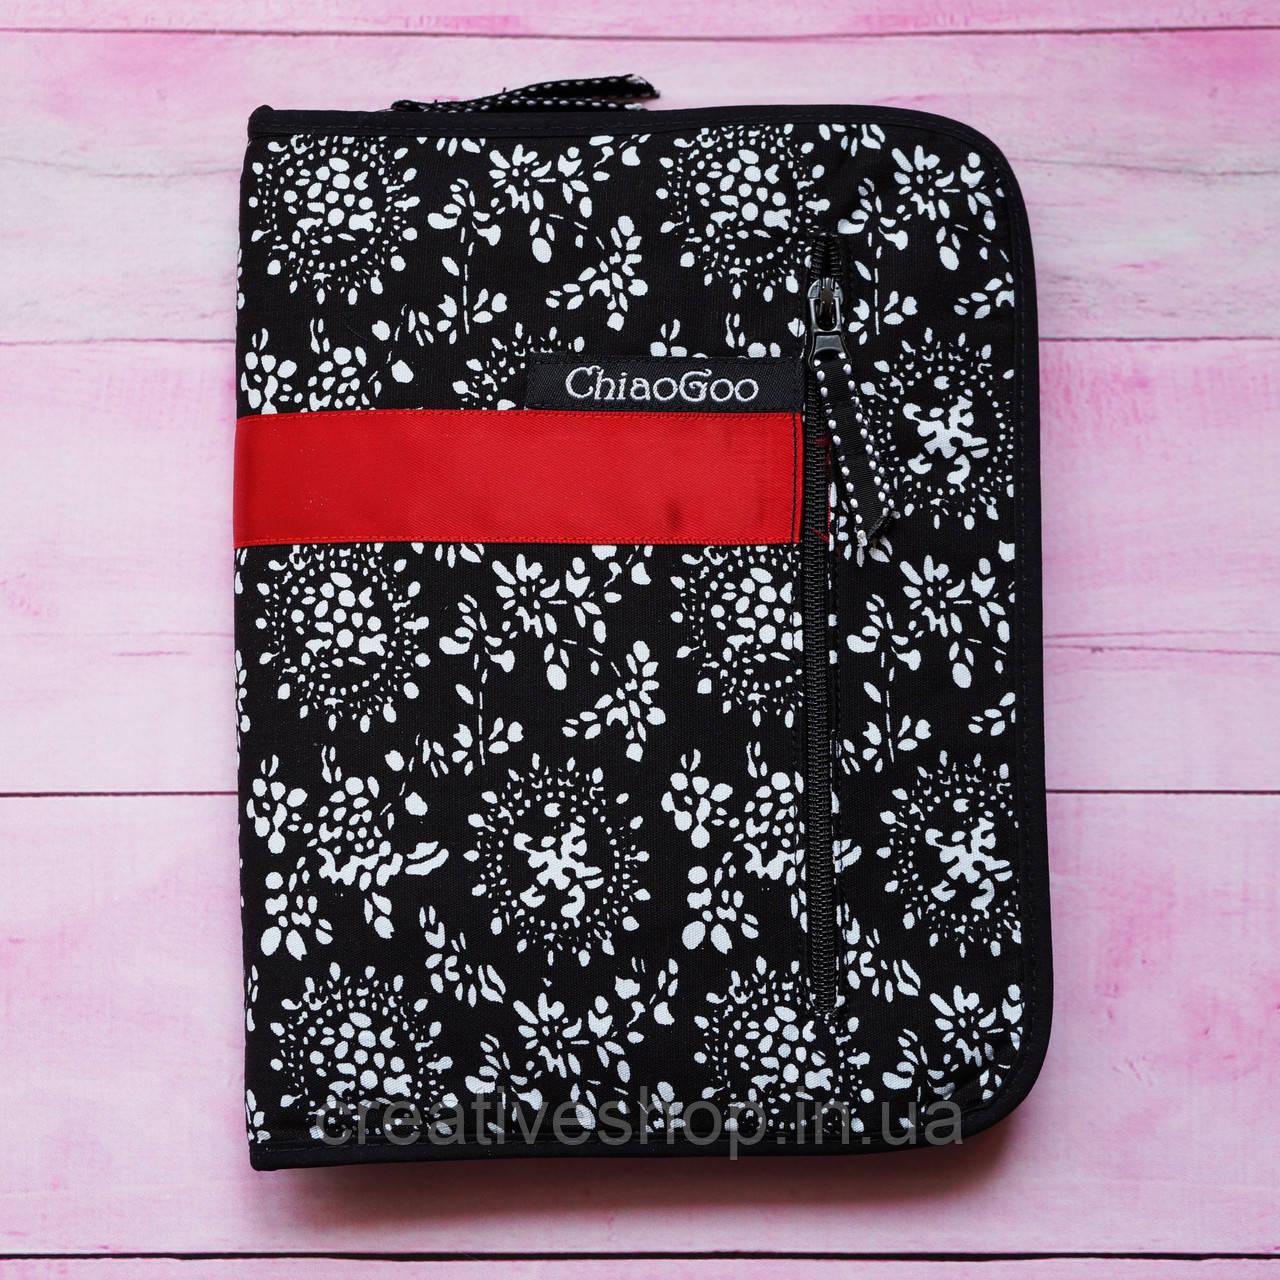 набор спиц Chiaogoo Complete 13 см продажа цена в одессе спицы